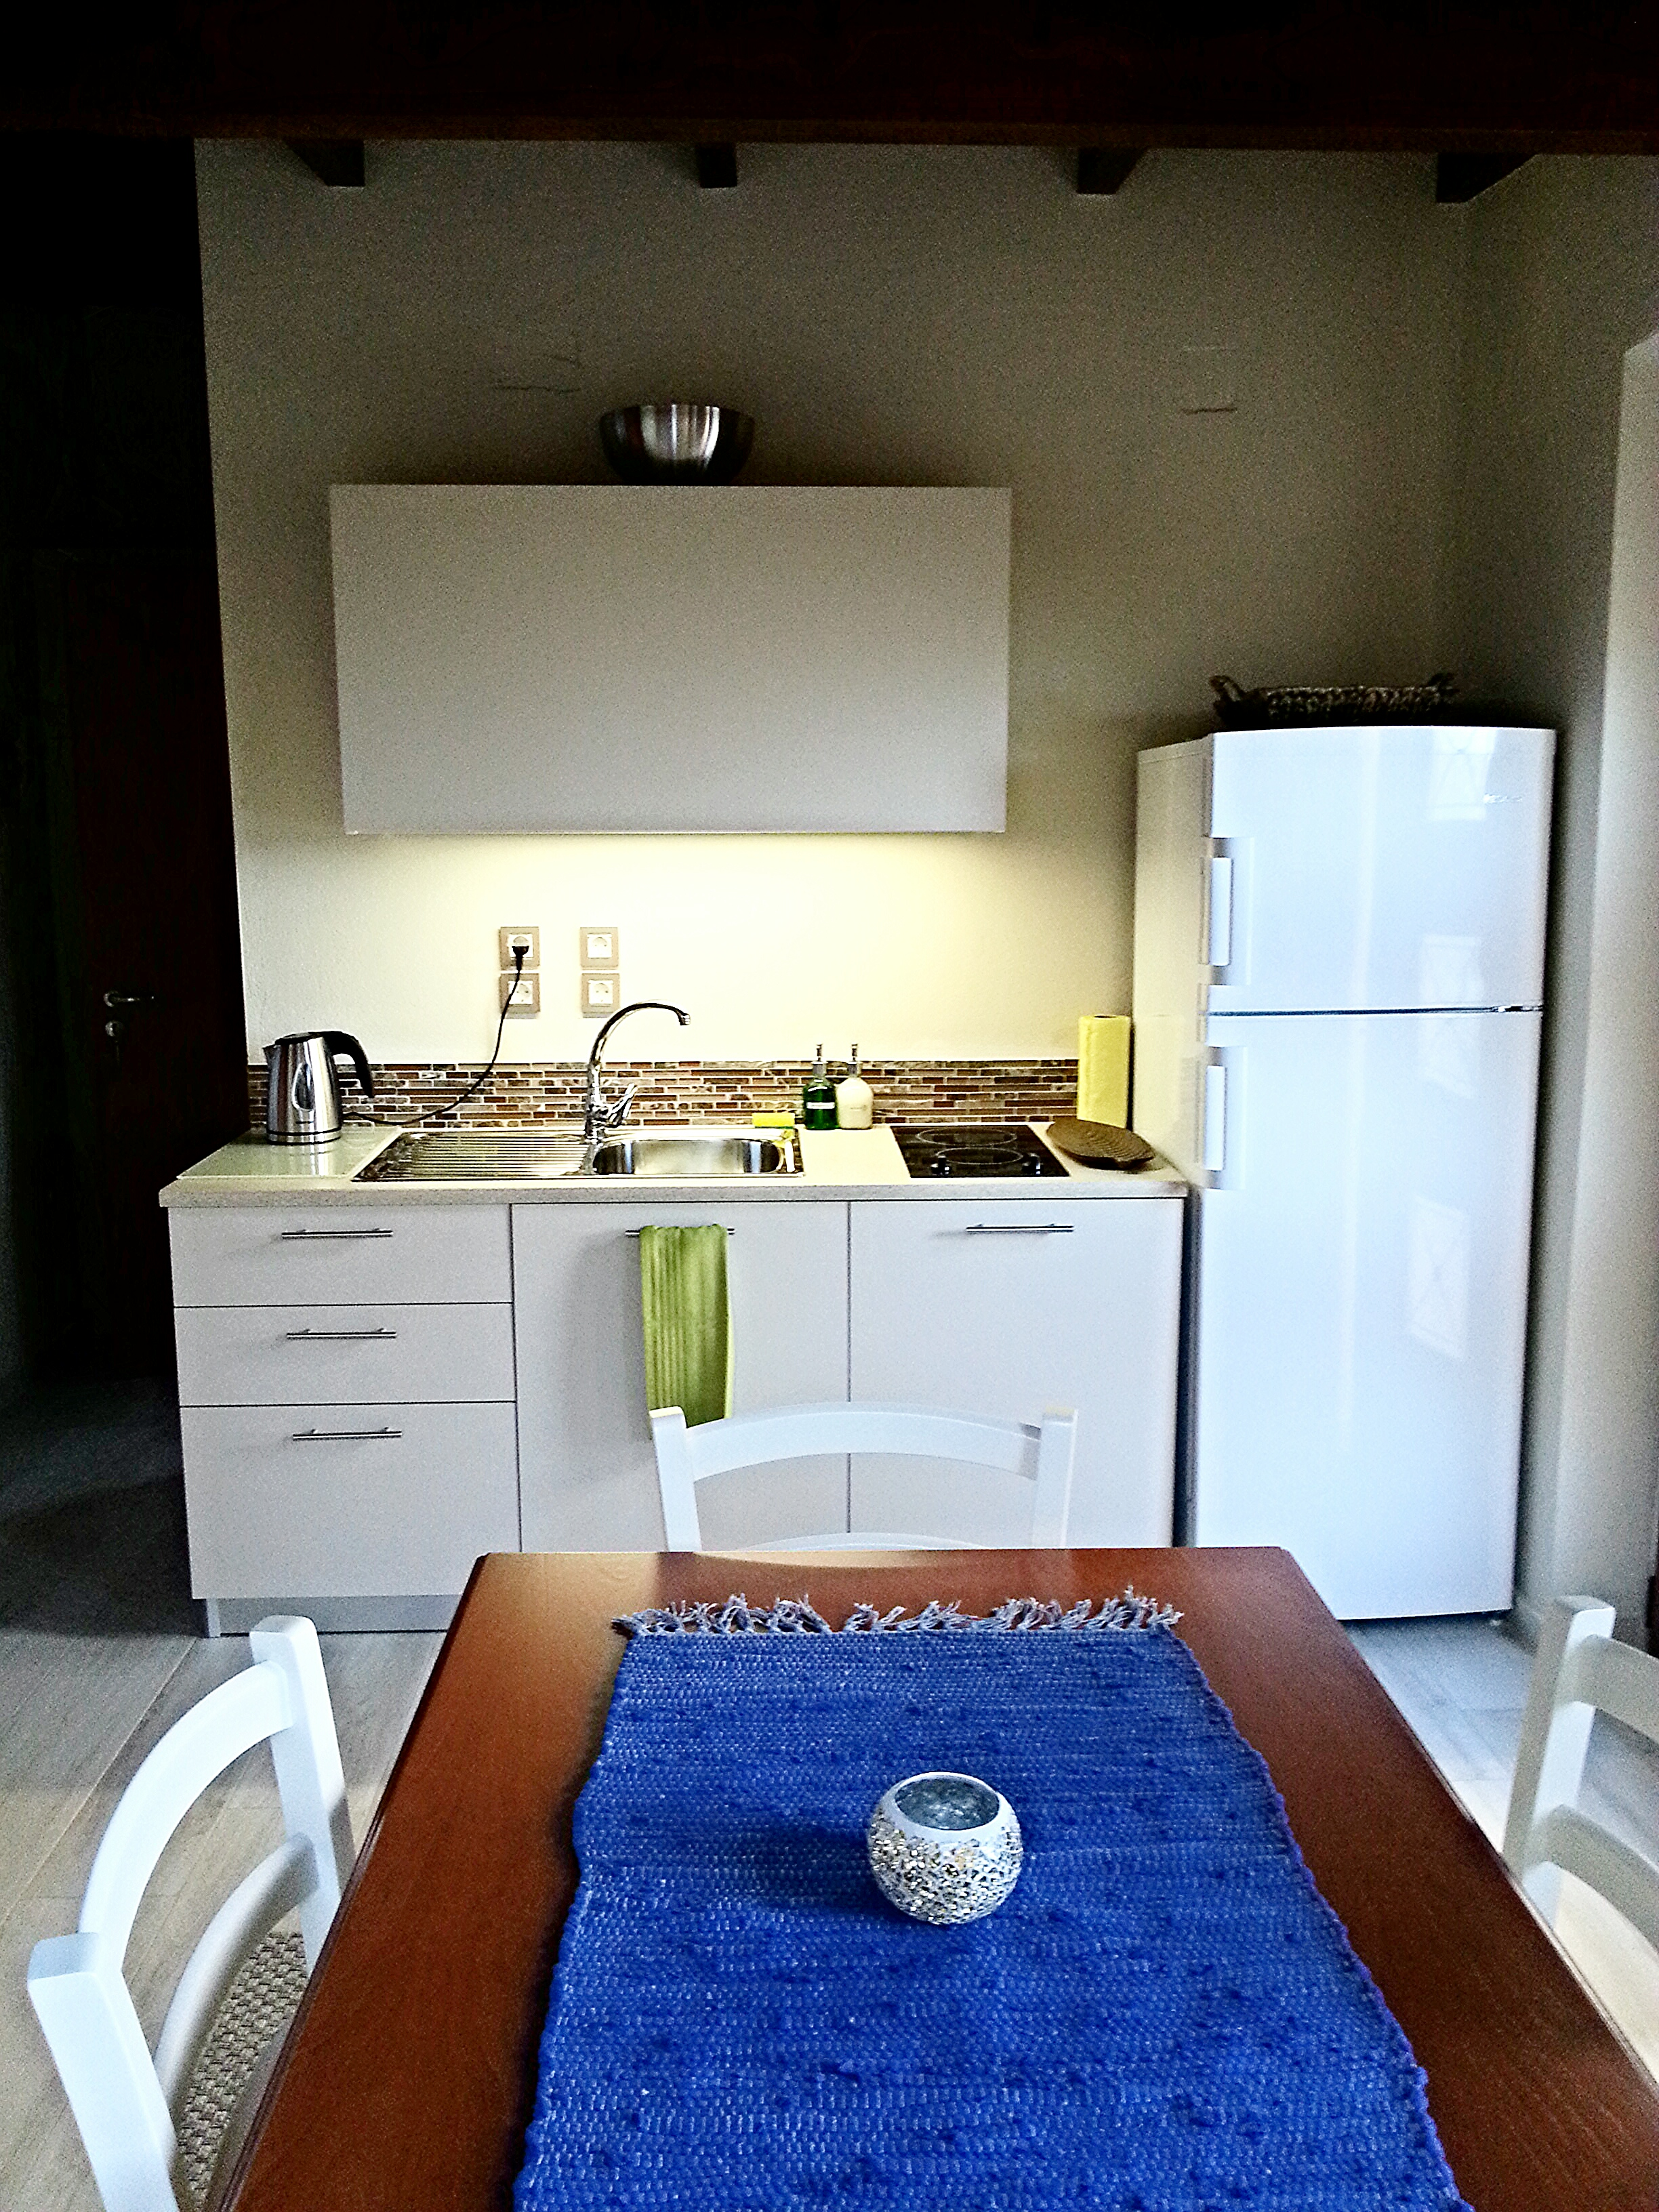 kitchenette with standard equipment